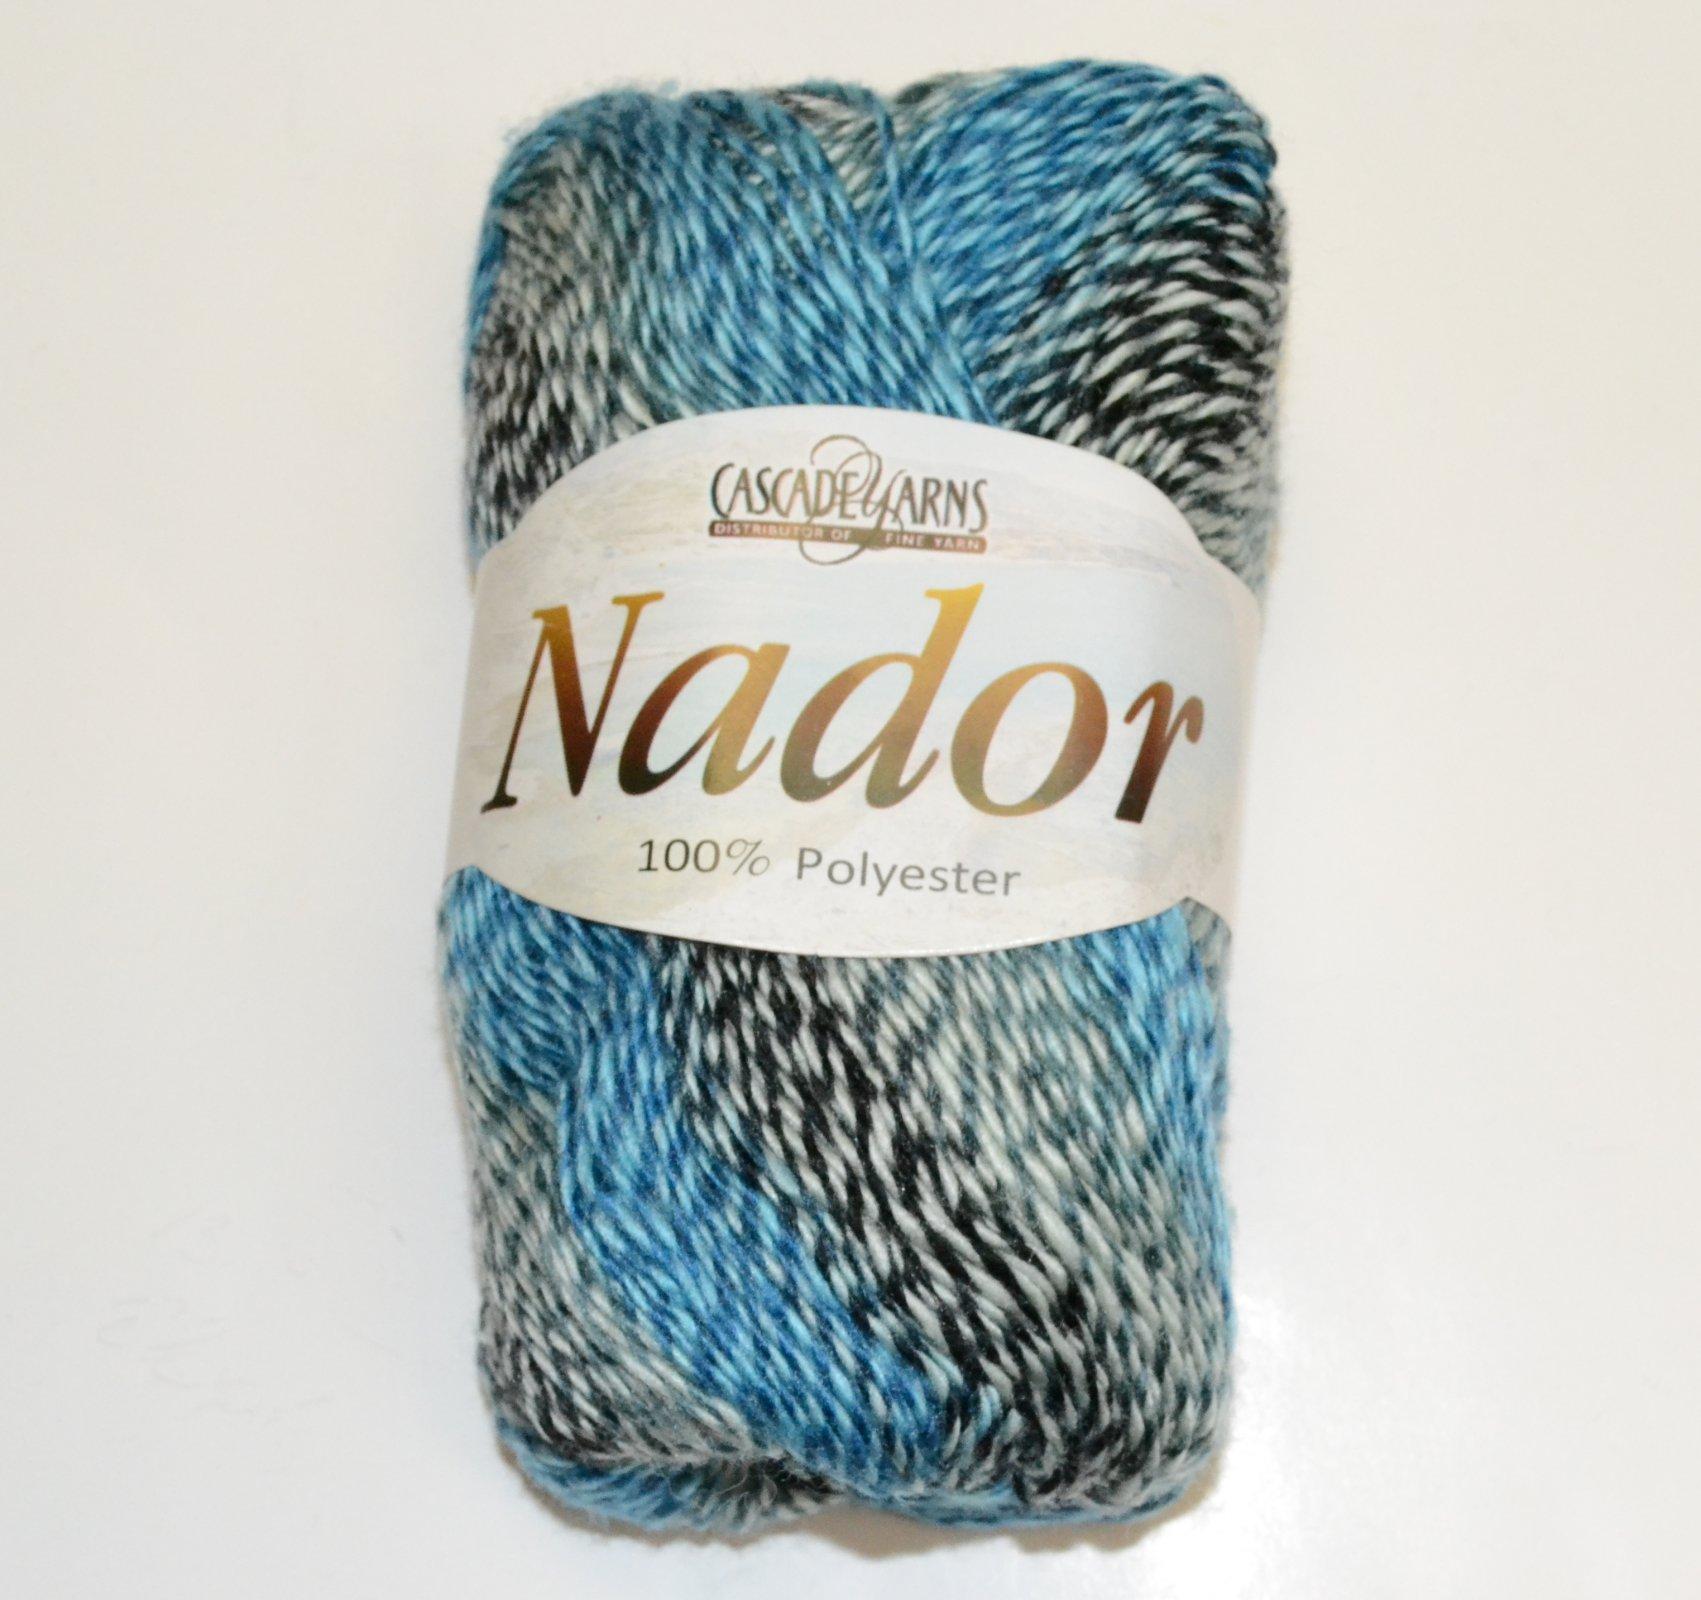 Nador - Limited Edition